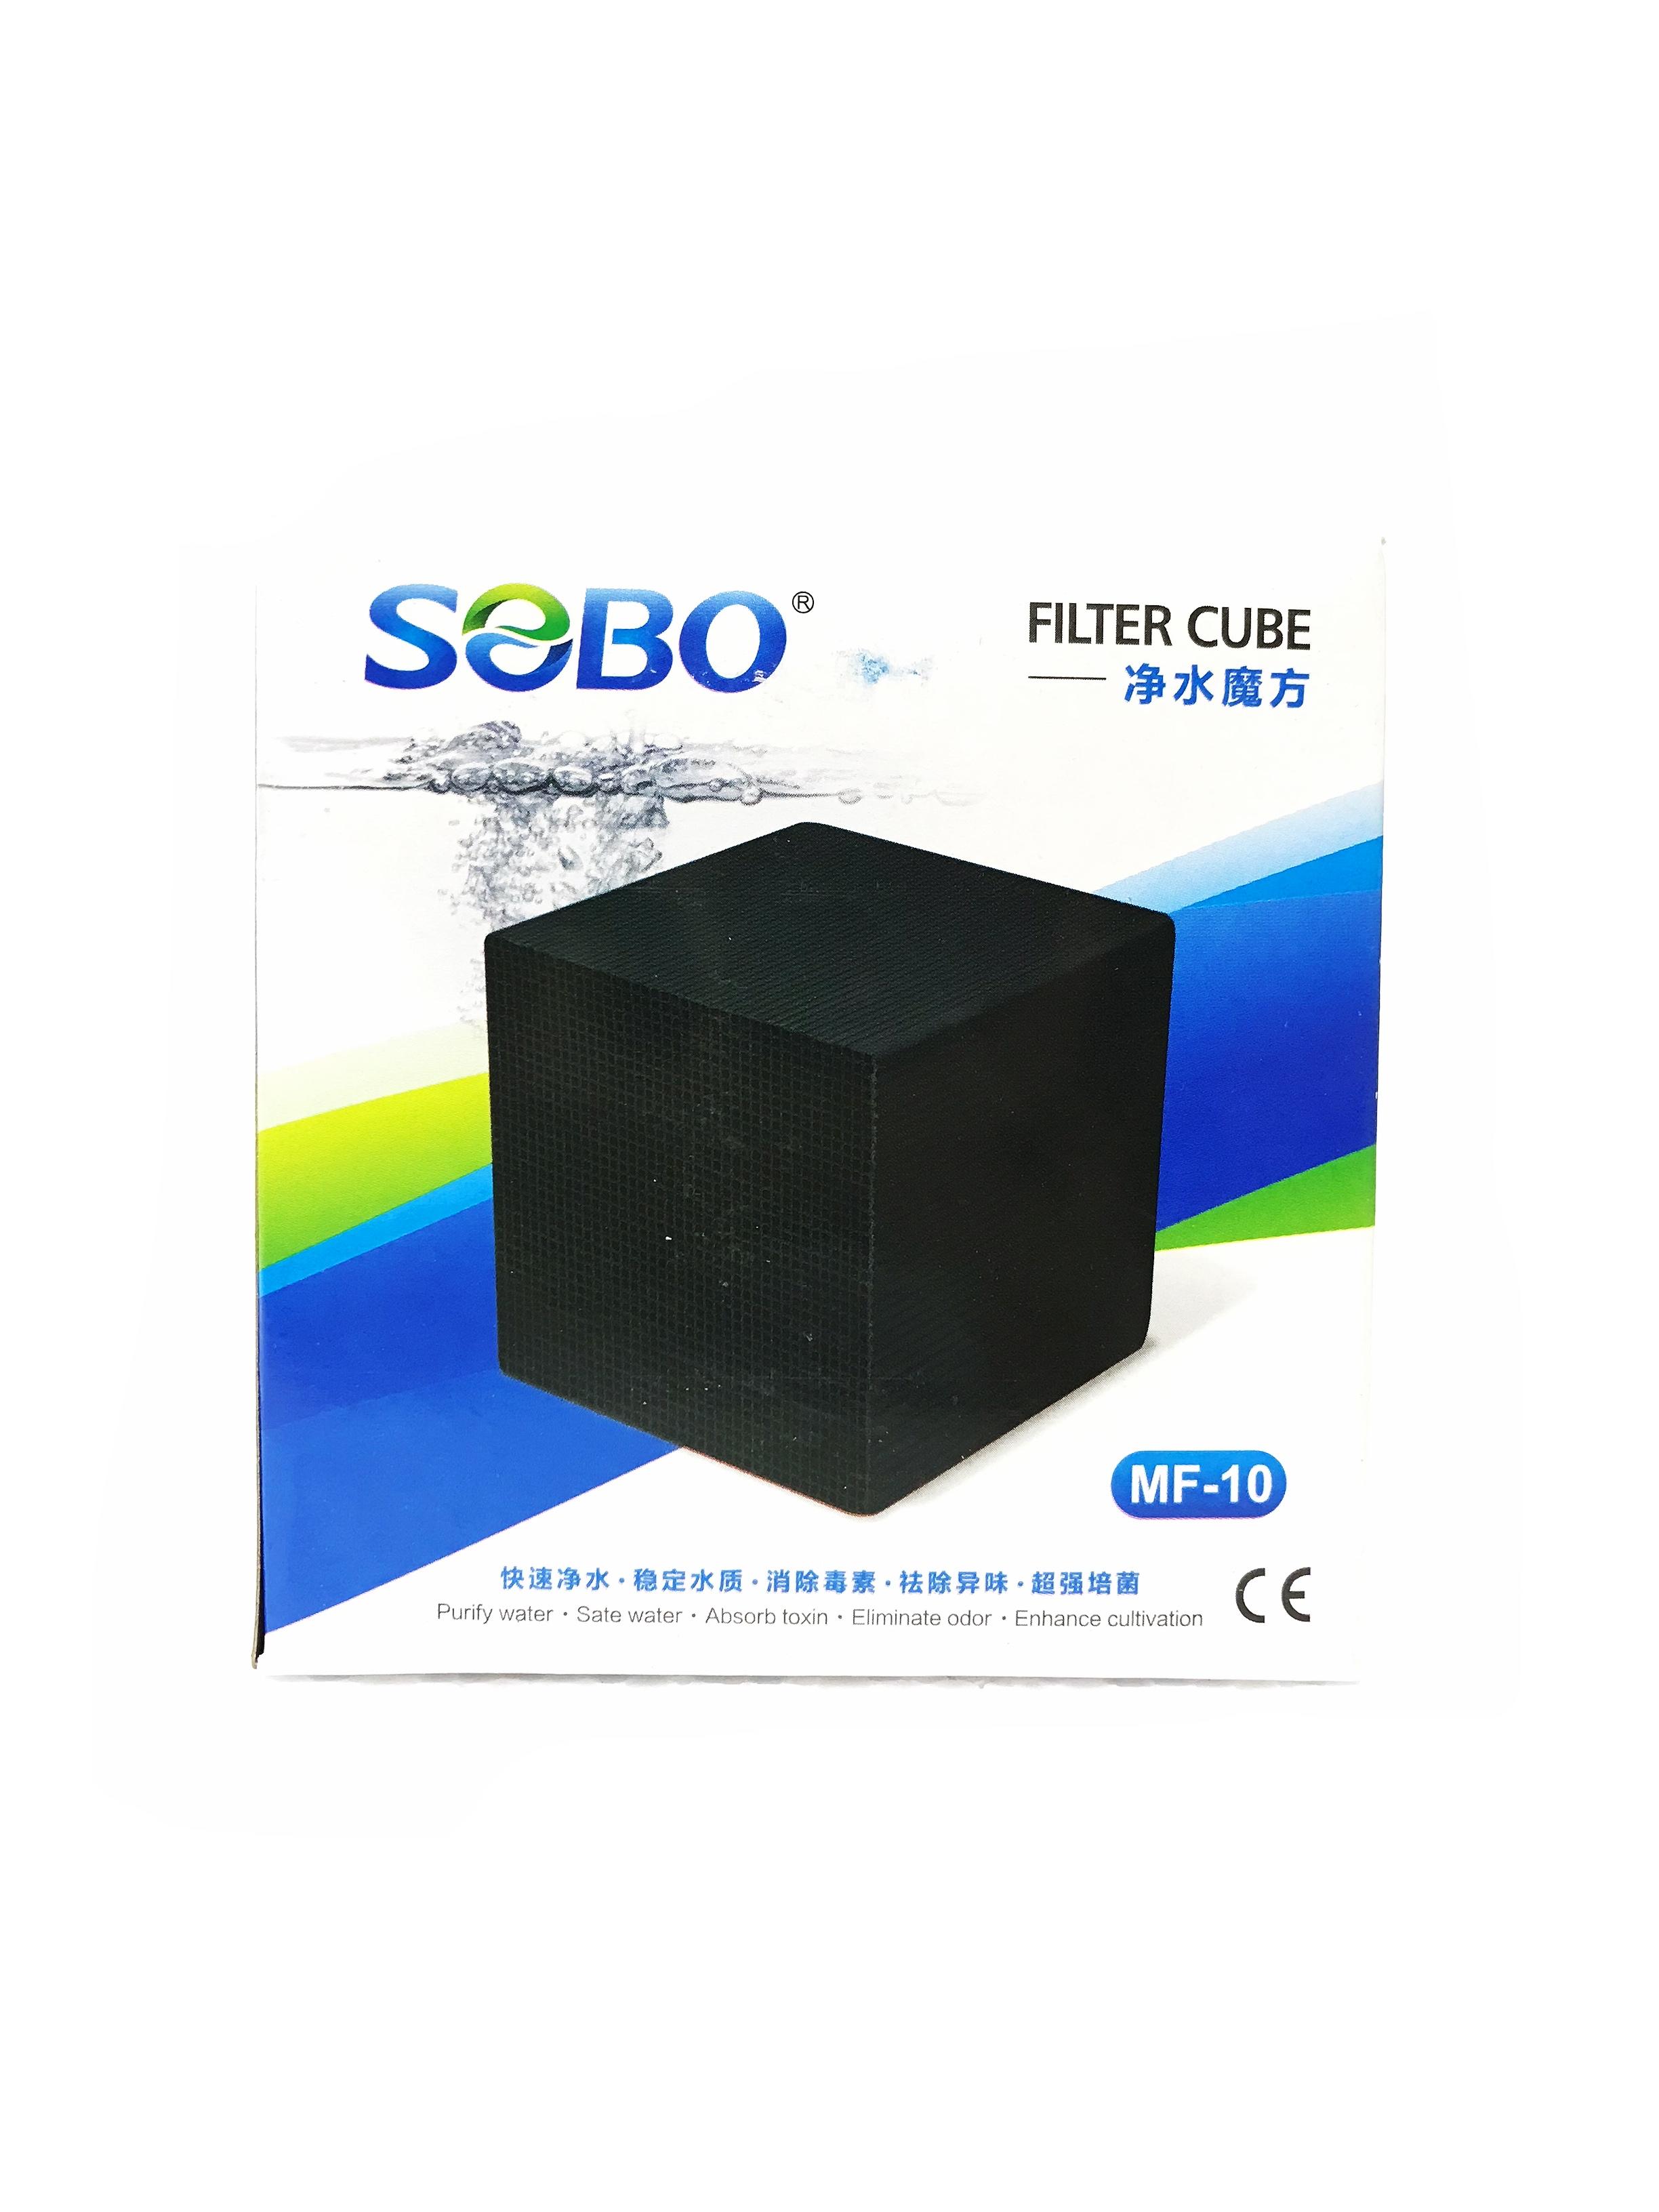 Sobo Filter Cube